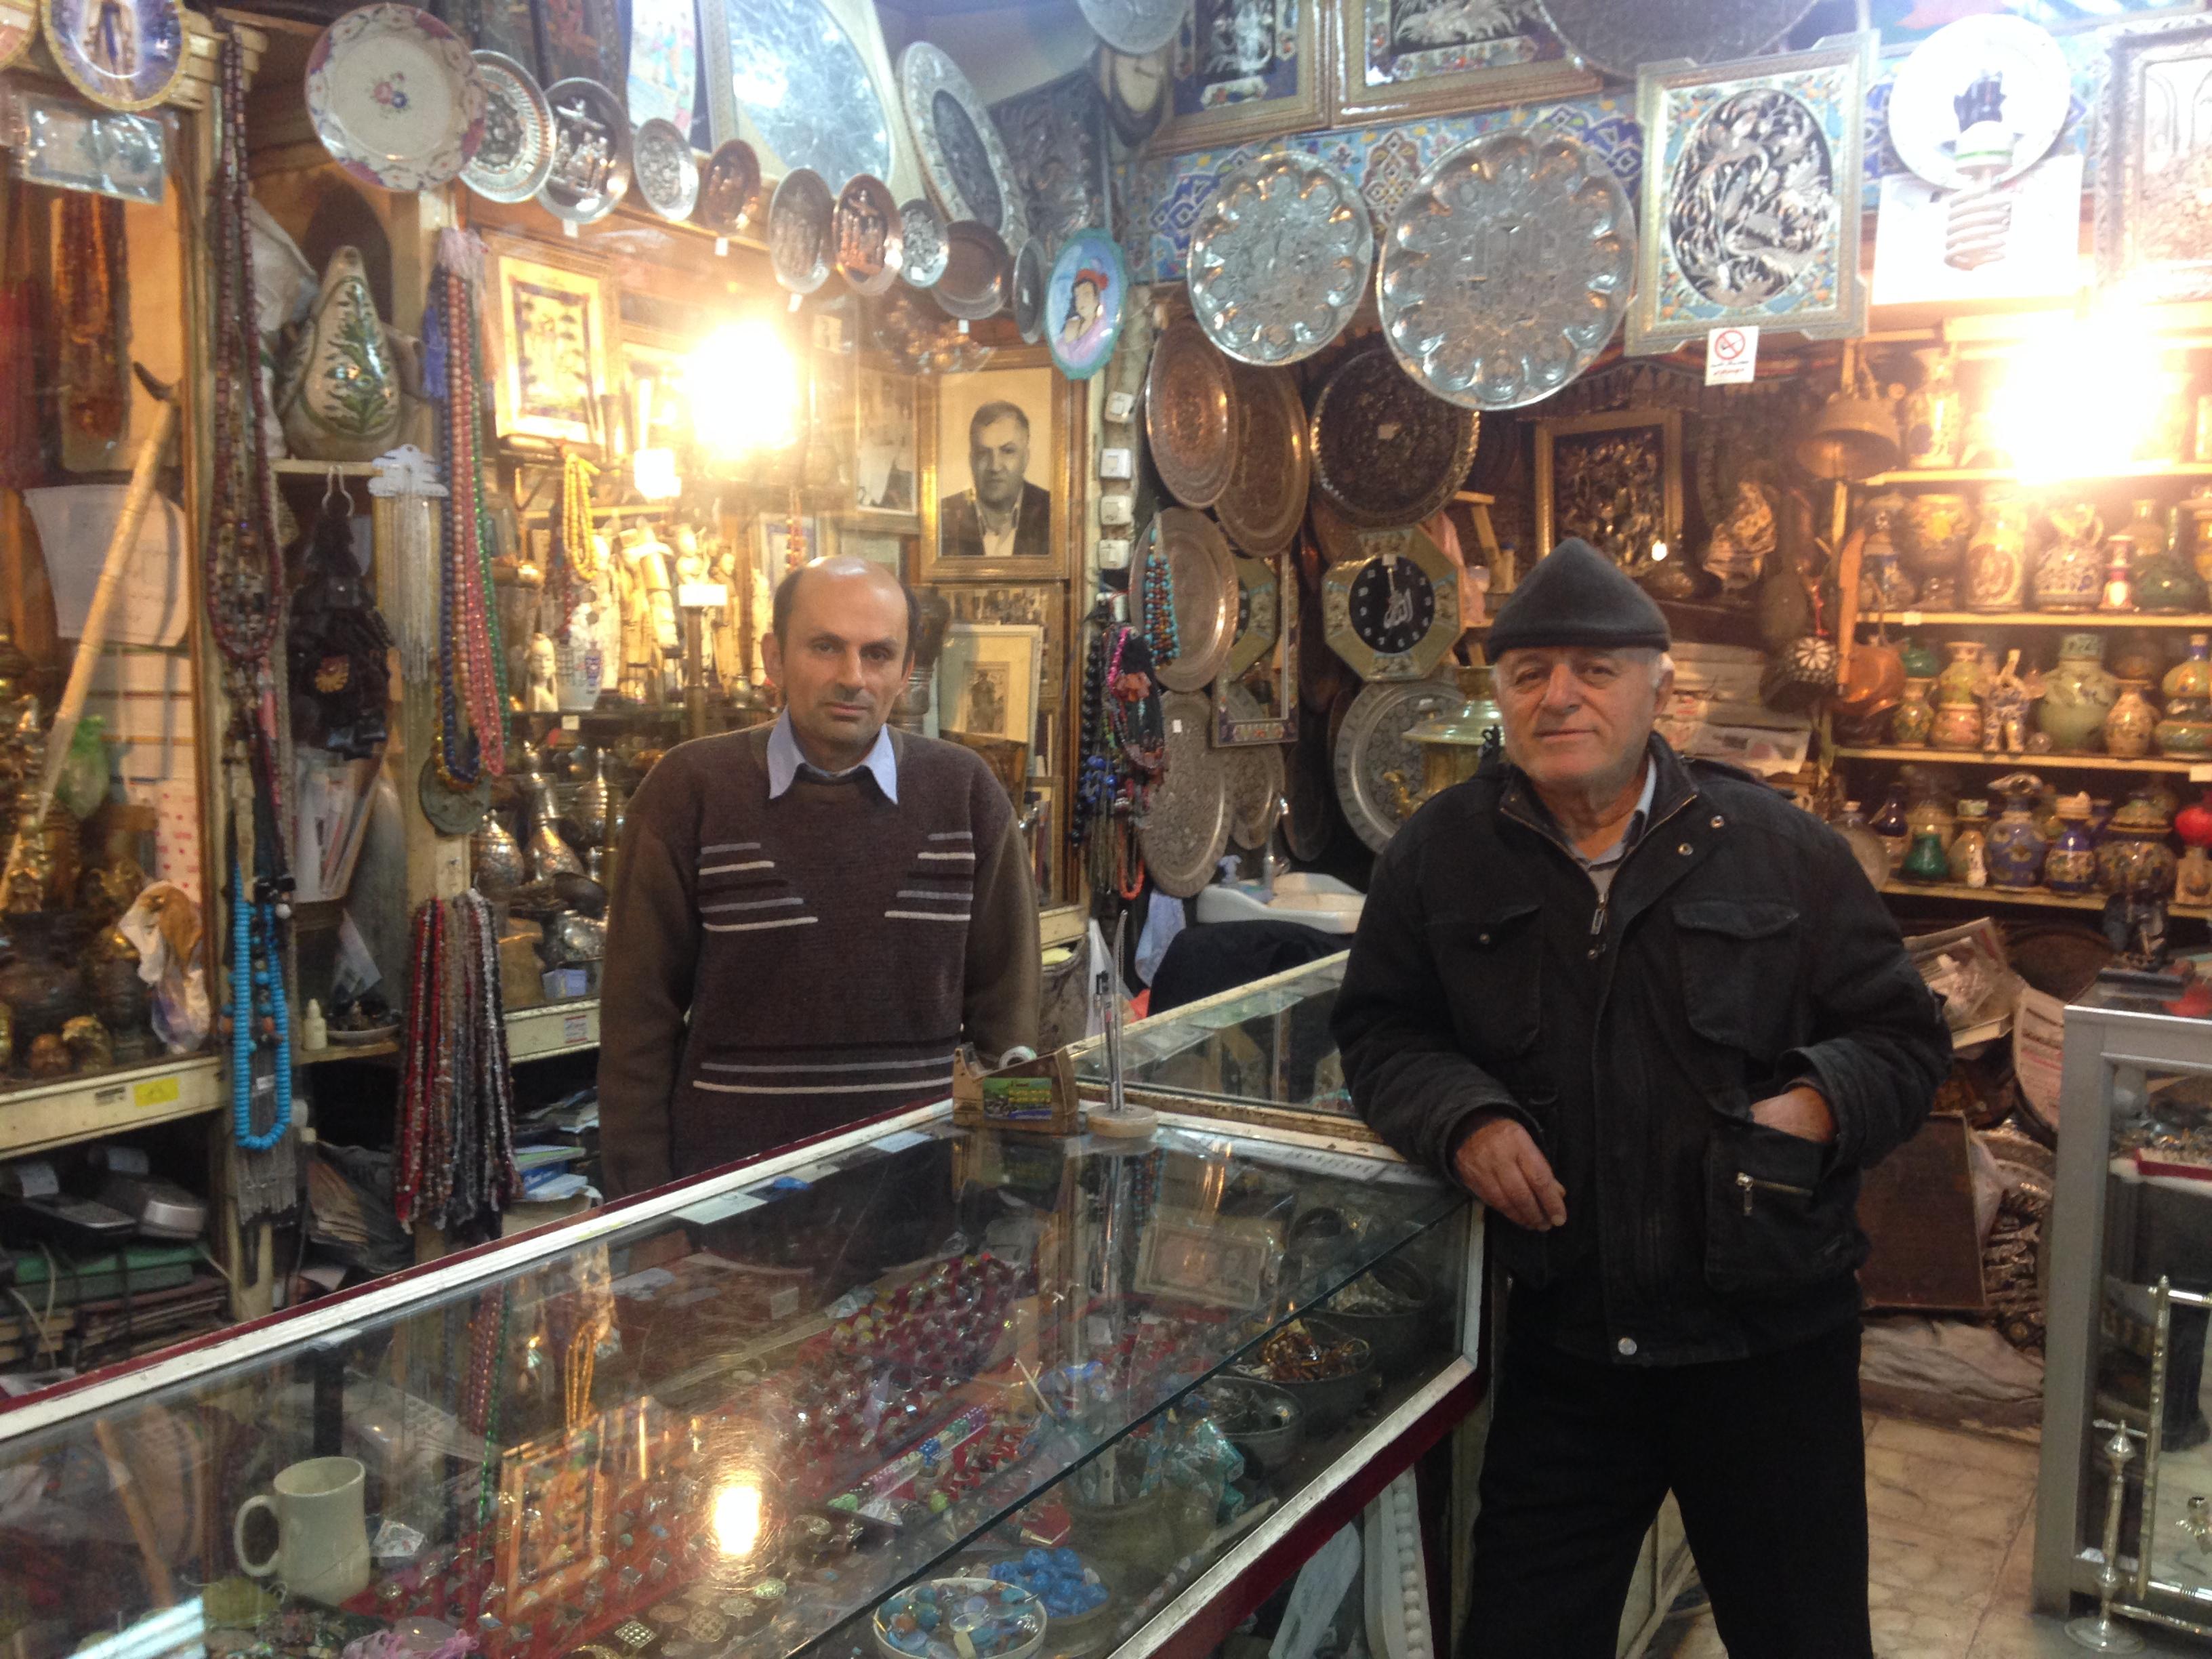 Iranian jewish dating site